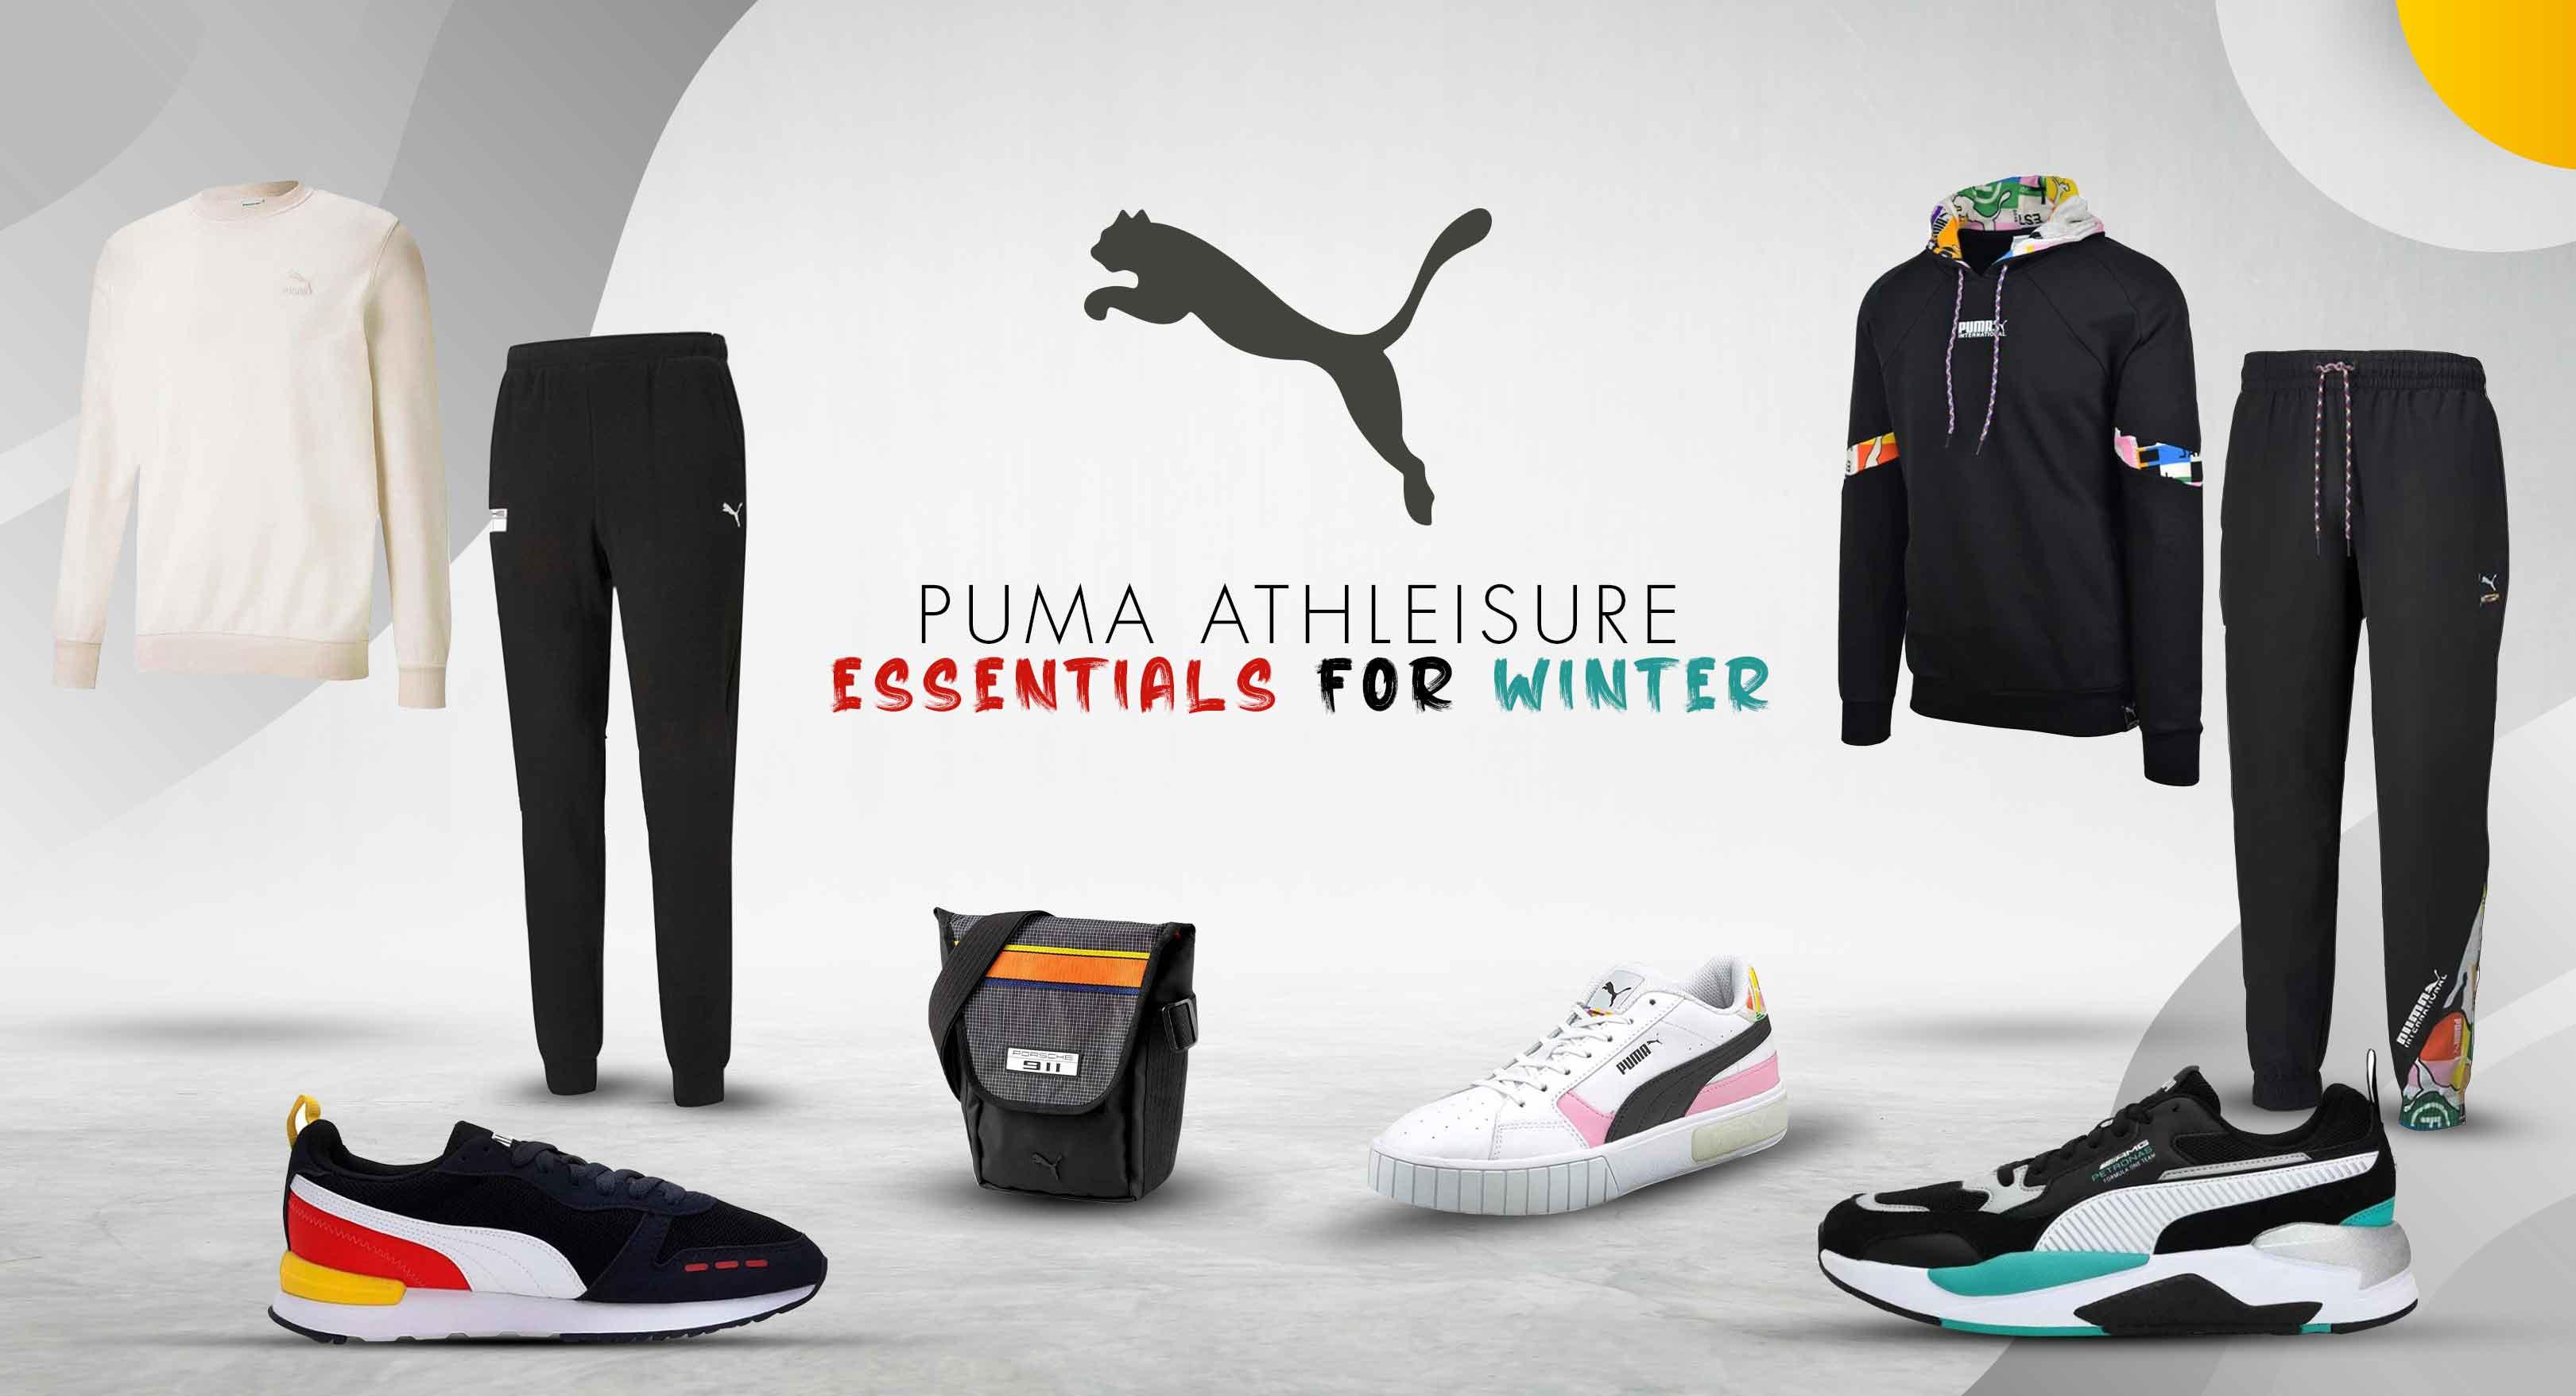 Puma Athleisure Essentials for Winter